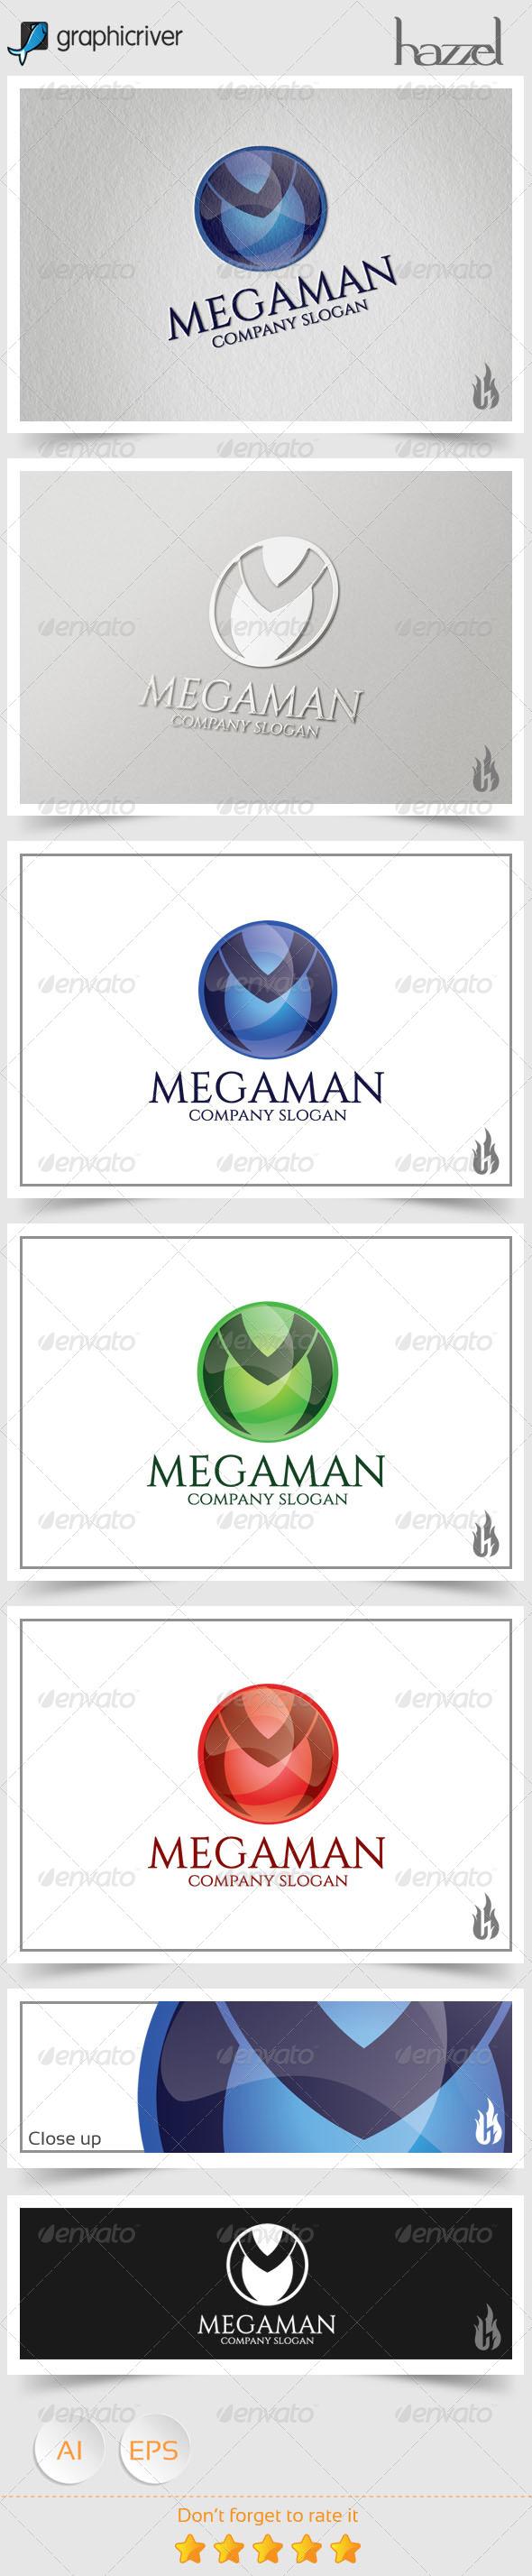 GraphicRiver Megaman Logo 8646688